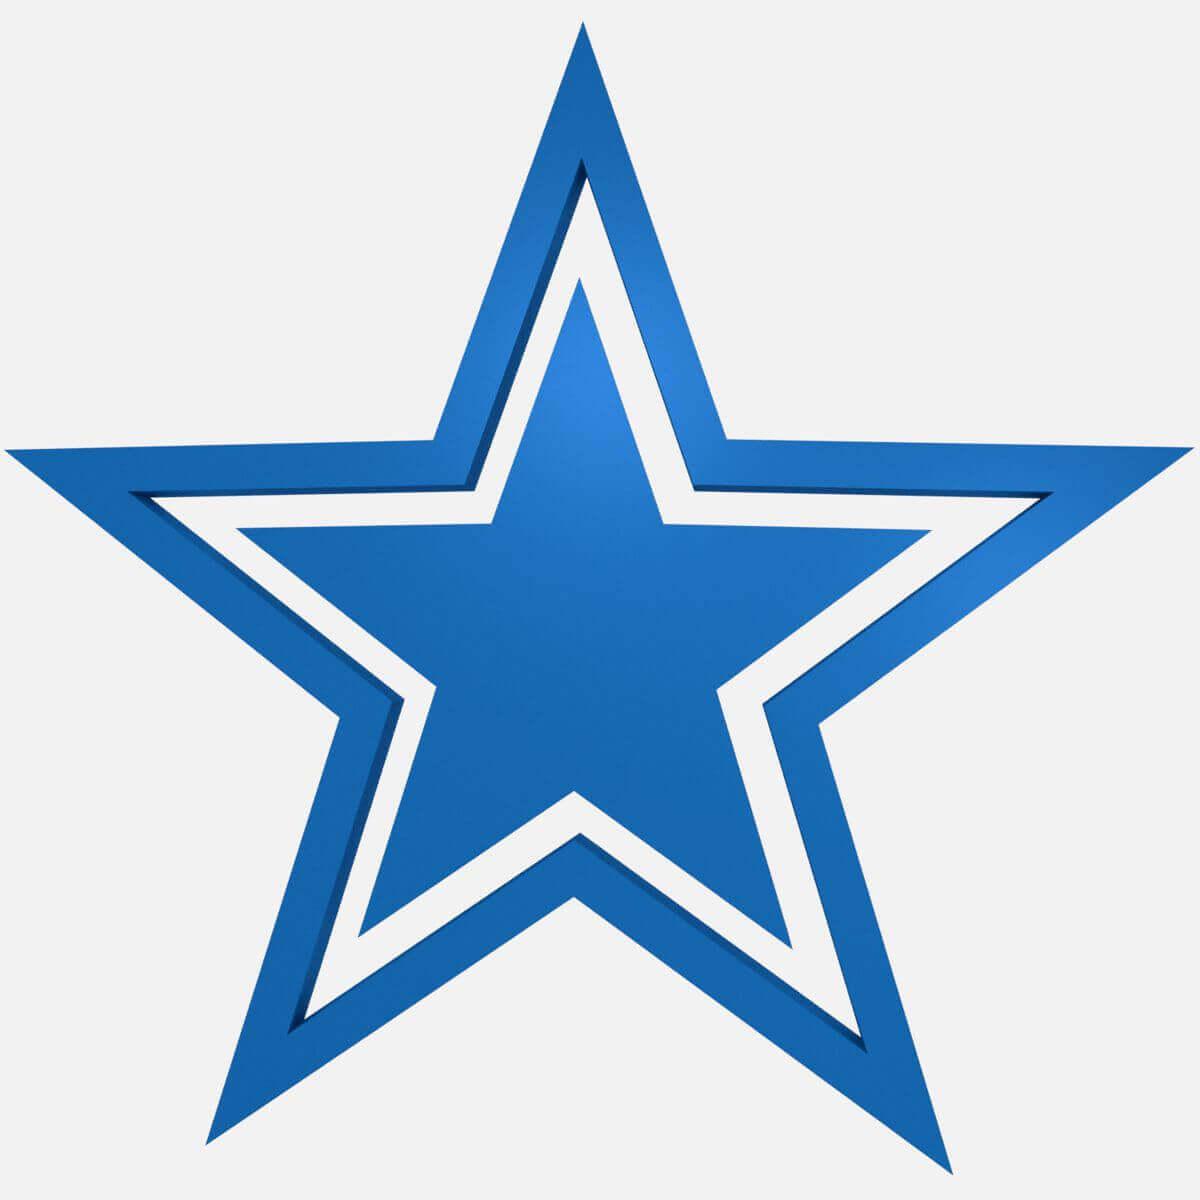 dallas cowboys football logo blue print ready 3d model rh renderhub com cowboys symbol images cowboys symbol images